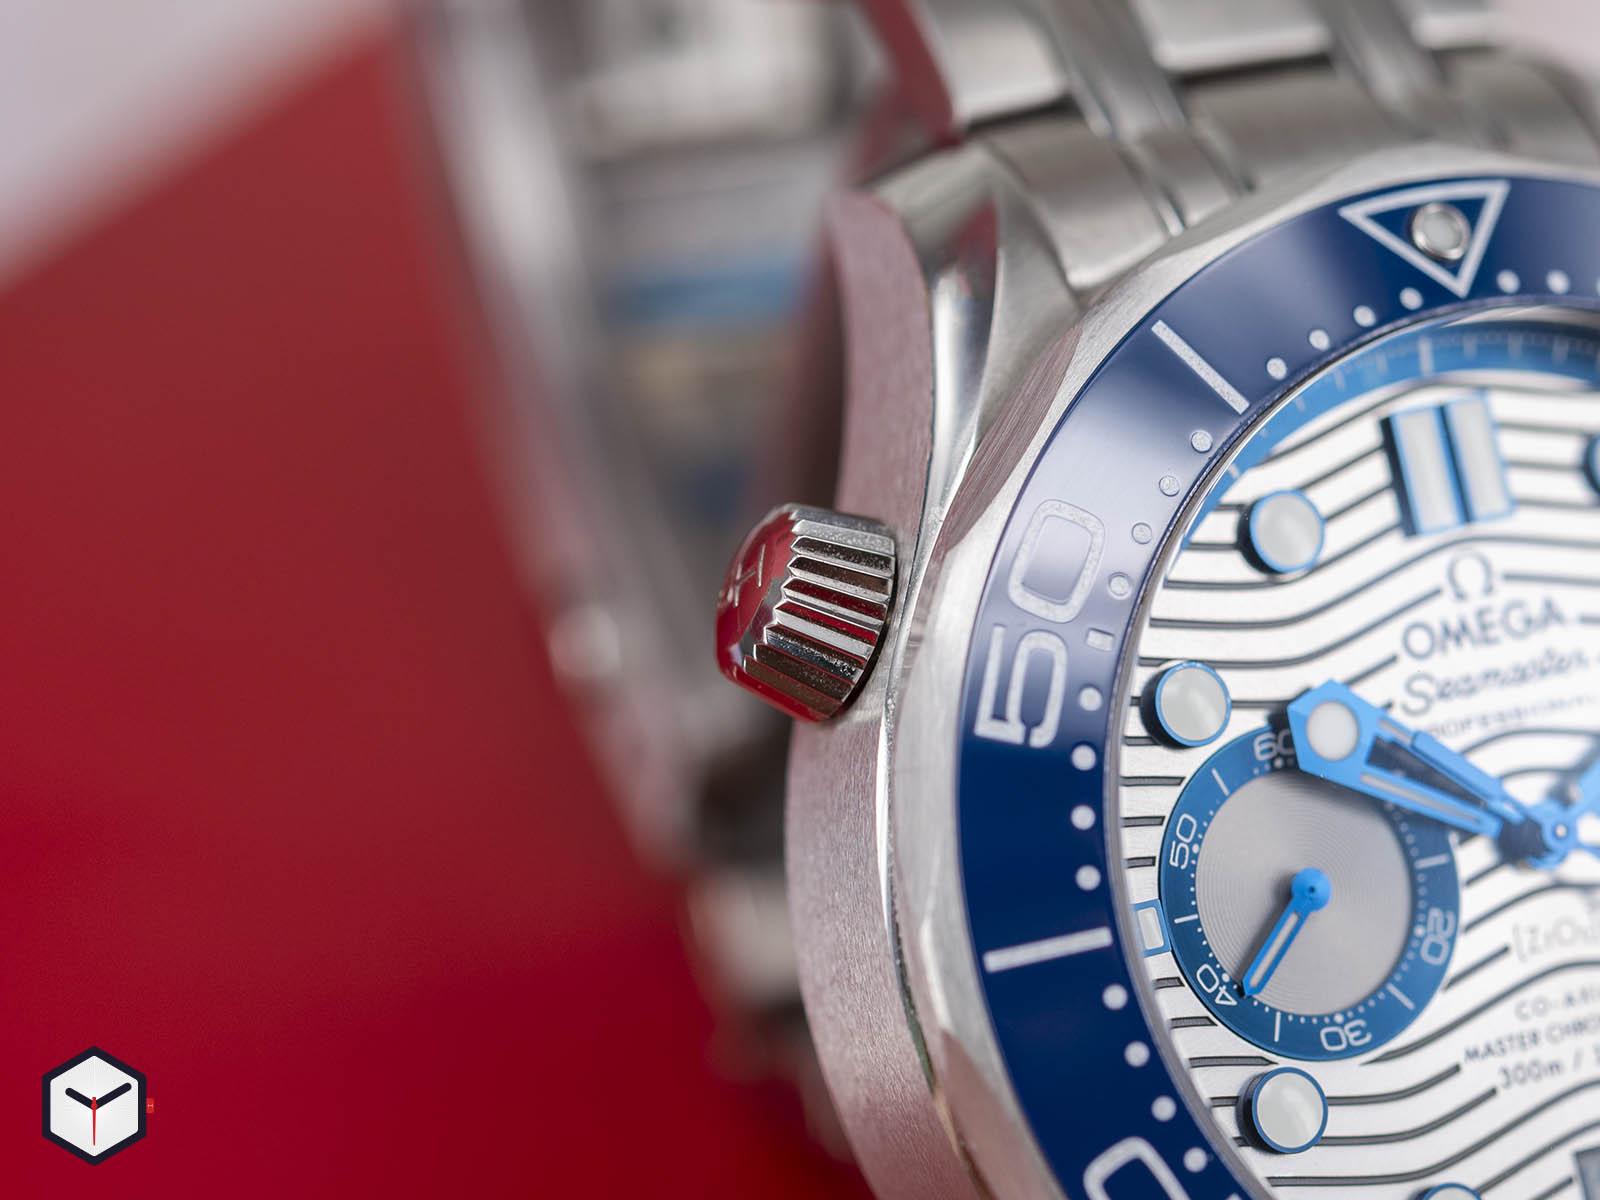 210-30-44-51-06-001-omega-diver-300m-co-axial-master-chronometer-chronograph-44-5.jpg